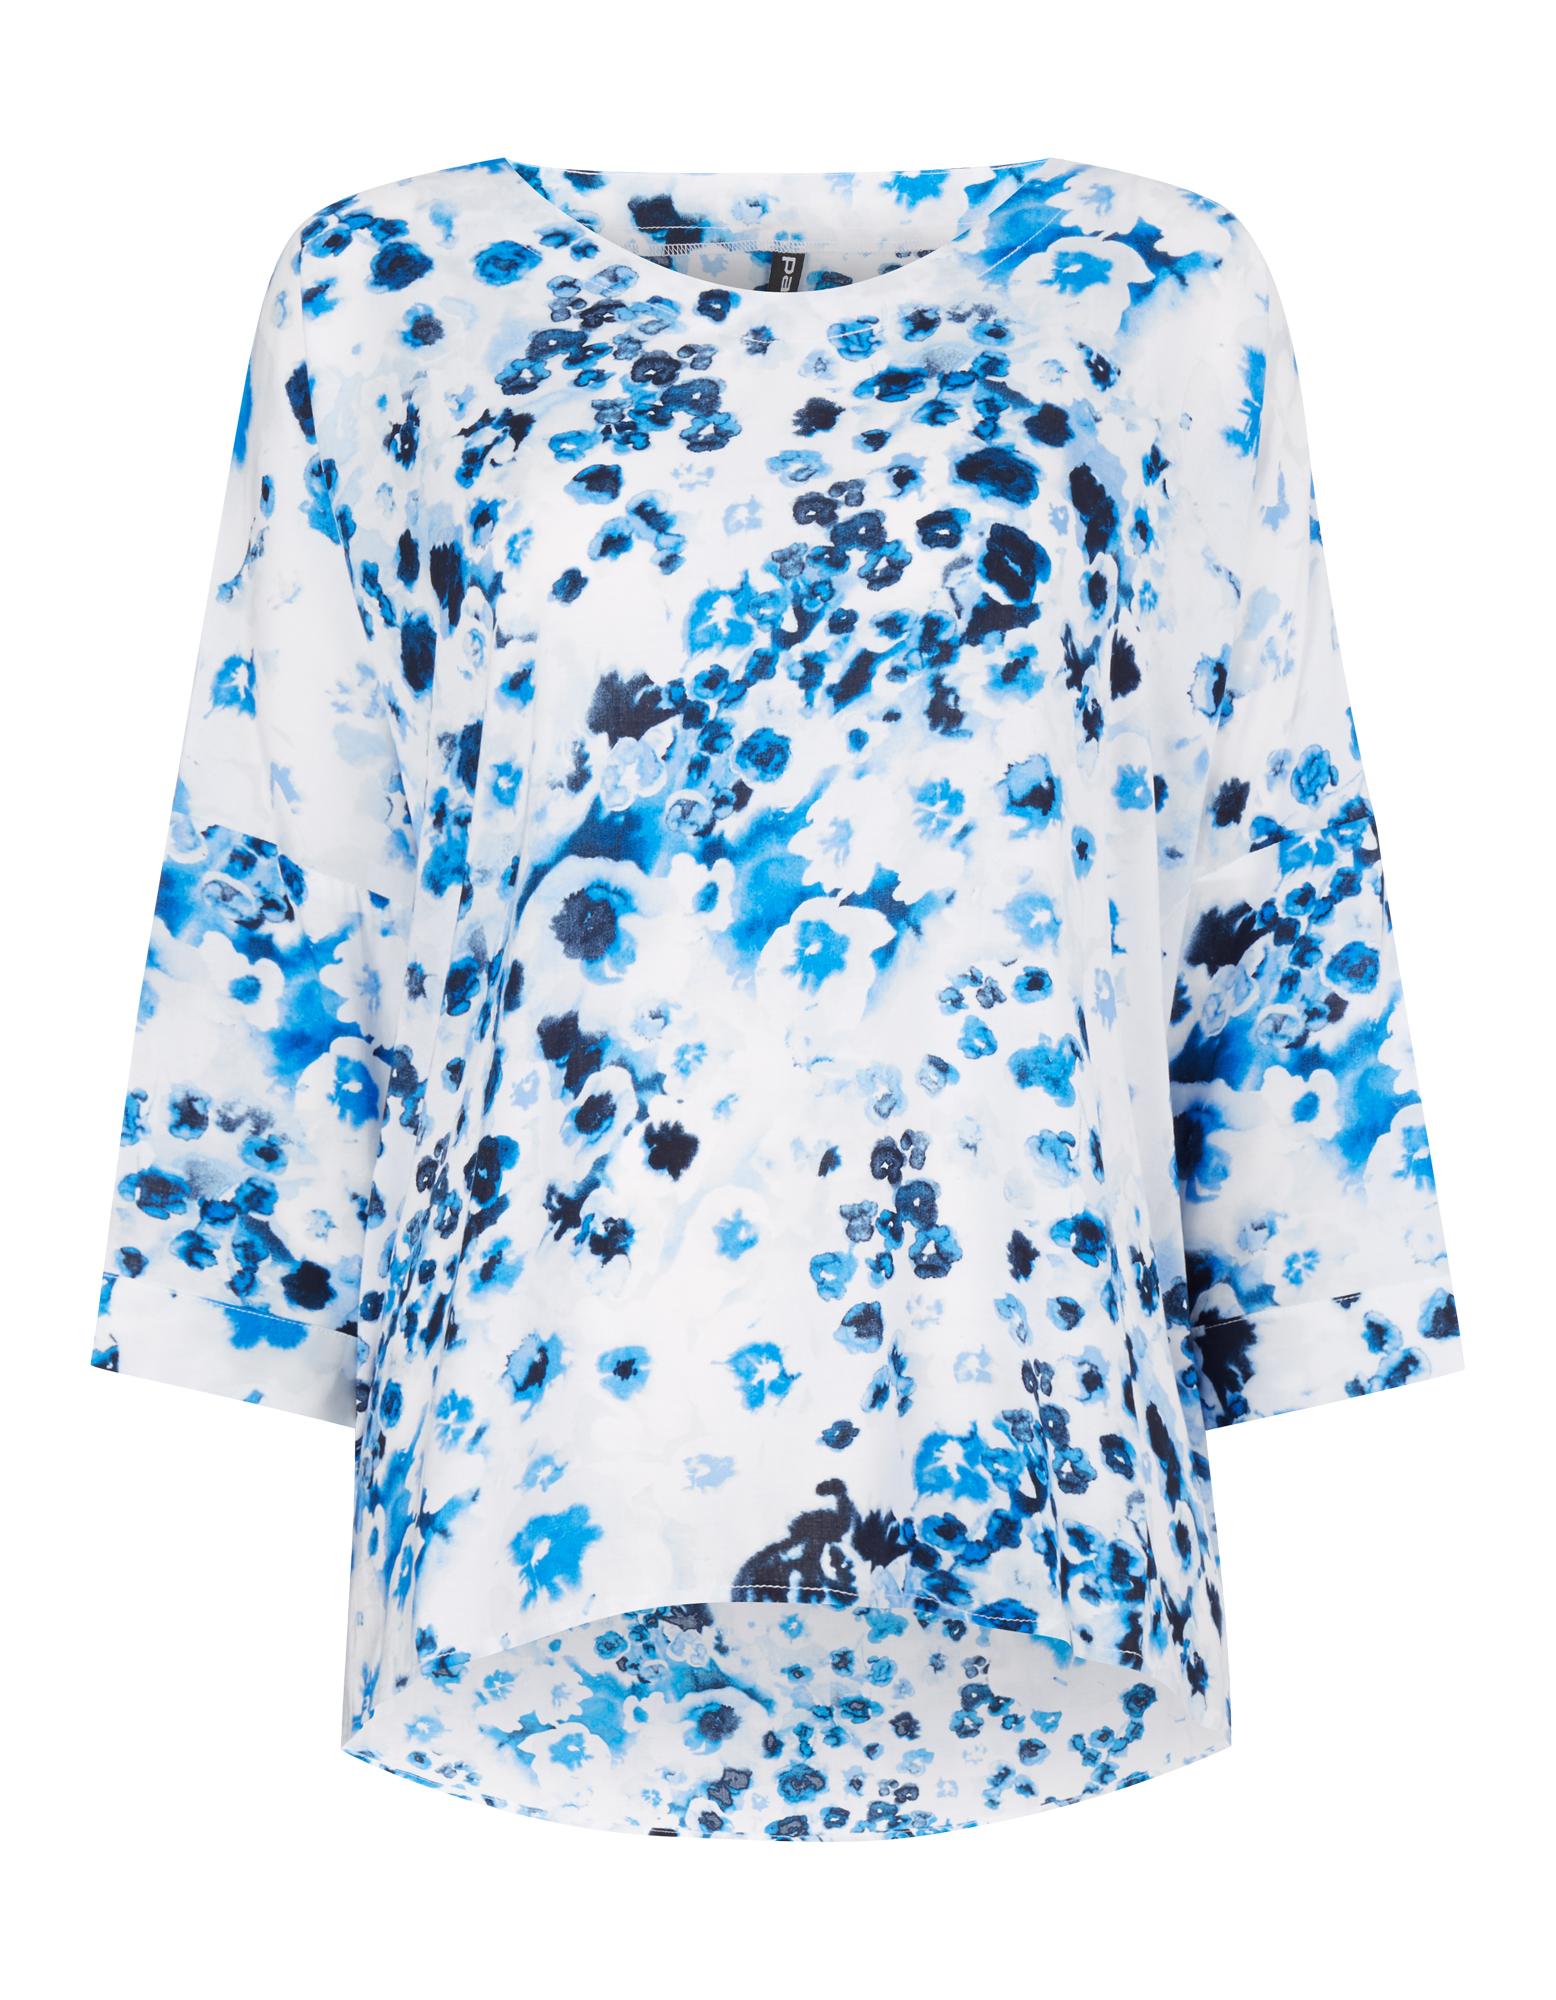 Damen Blusenshirt mit floralem Muster